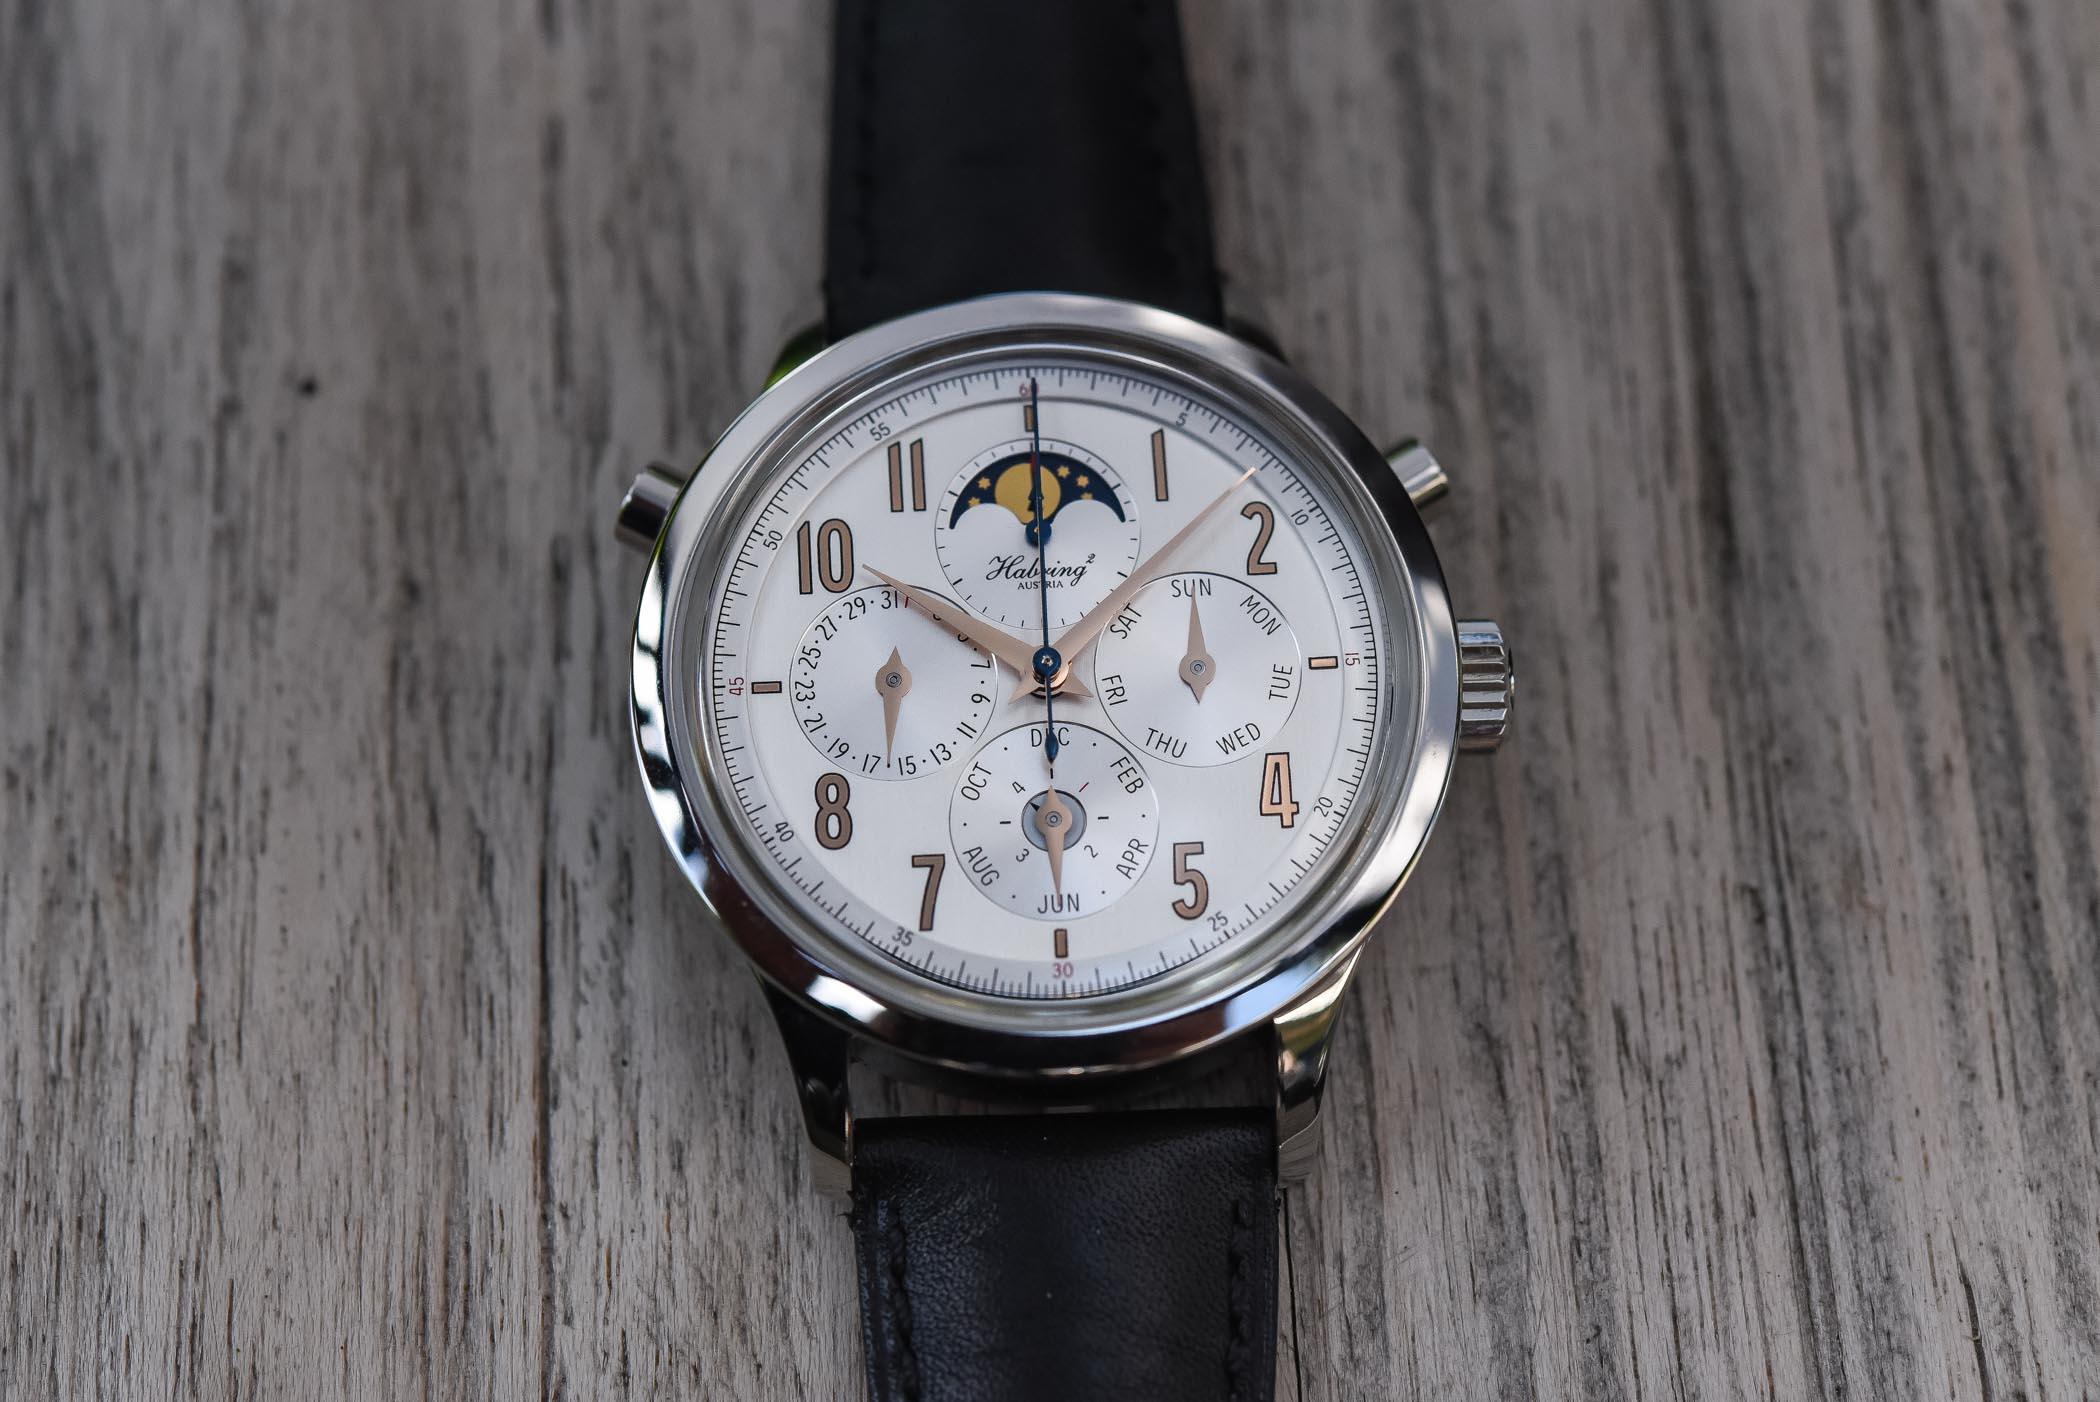 Habring2 Perpetual-Doppel Split-Seconds Chronograph Perpetual Calendar